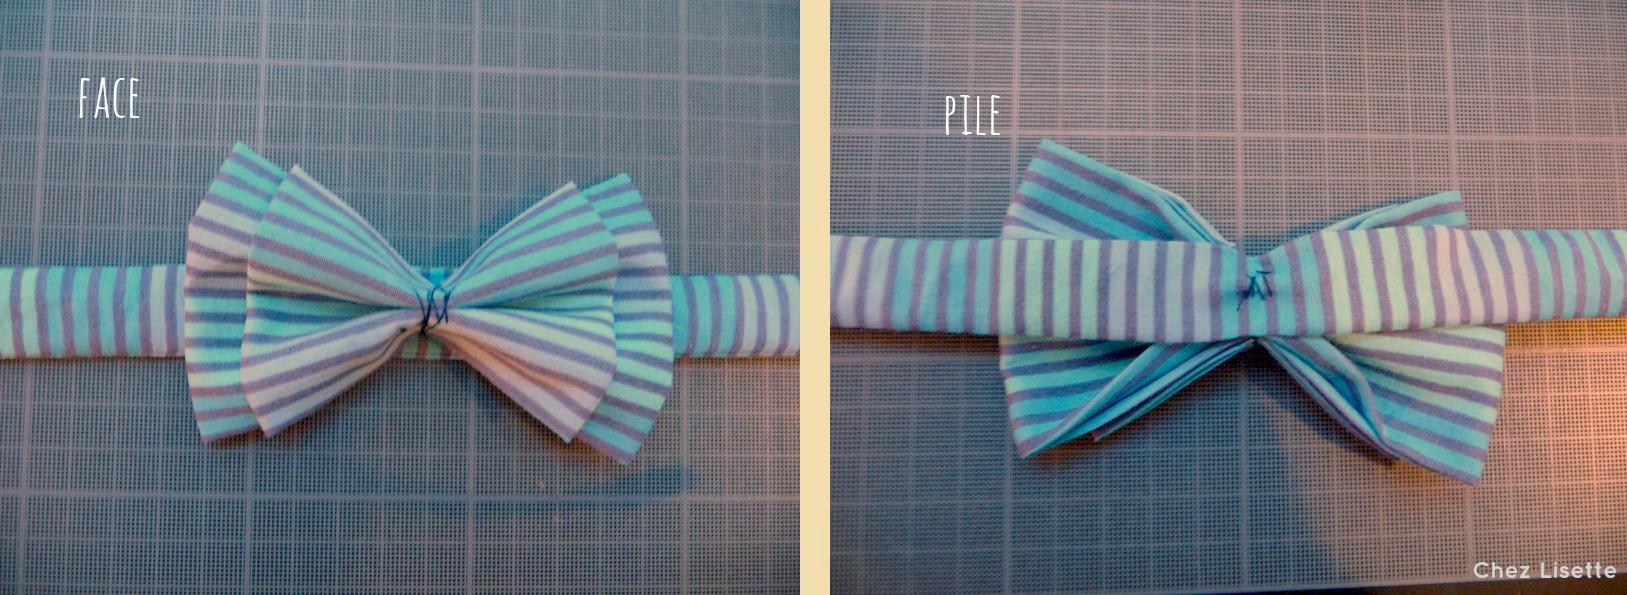 Turbo DIY nœud papillon - Transformation ! - Chez Lisette NA26